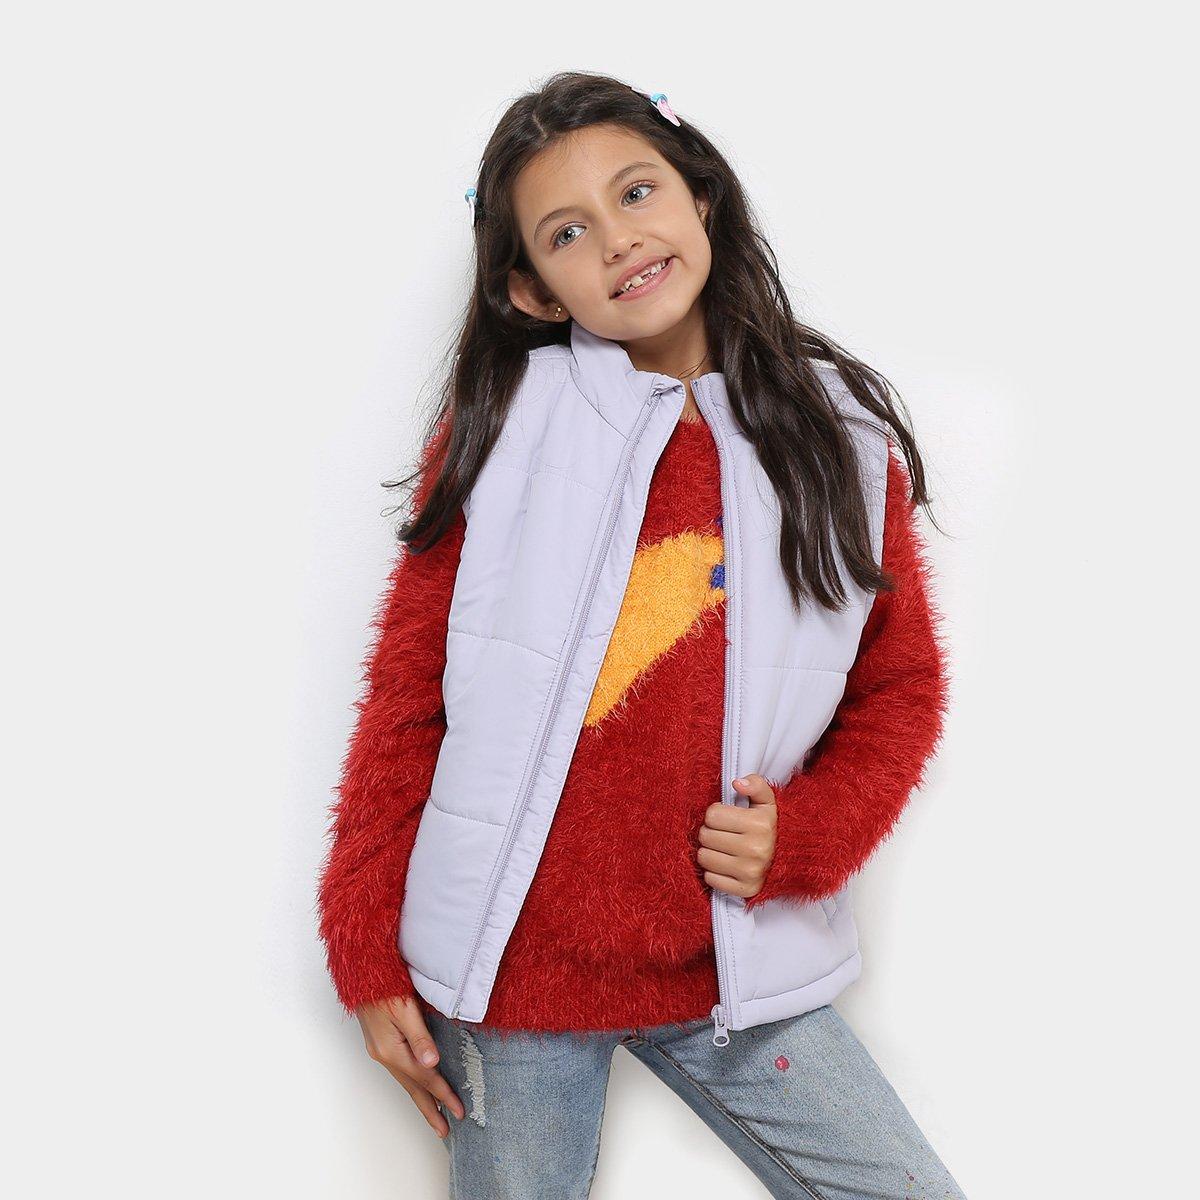 c66312b24ce8a Colete Infantil Zeep! Puffer Feminino - Lilás - Compre Agora